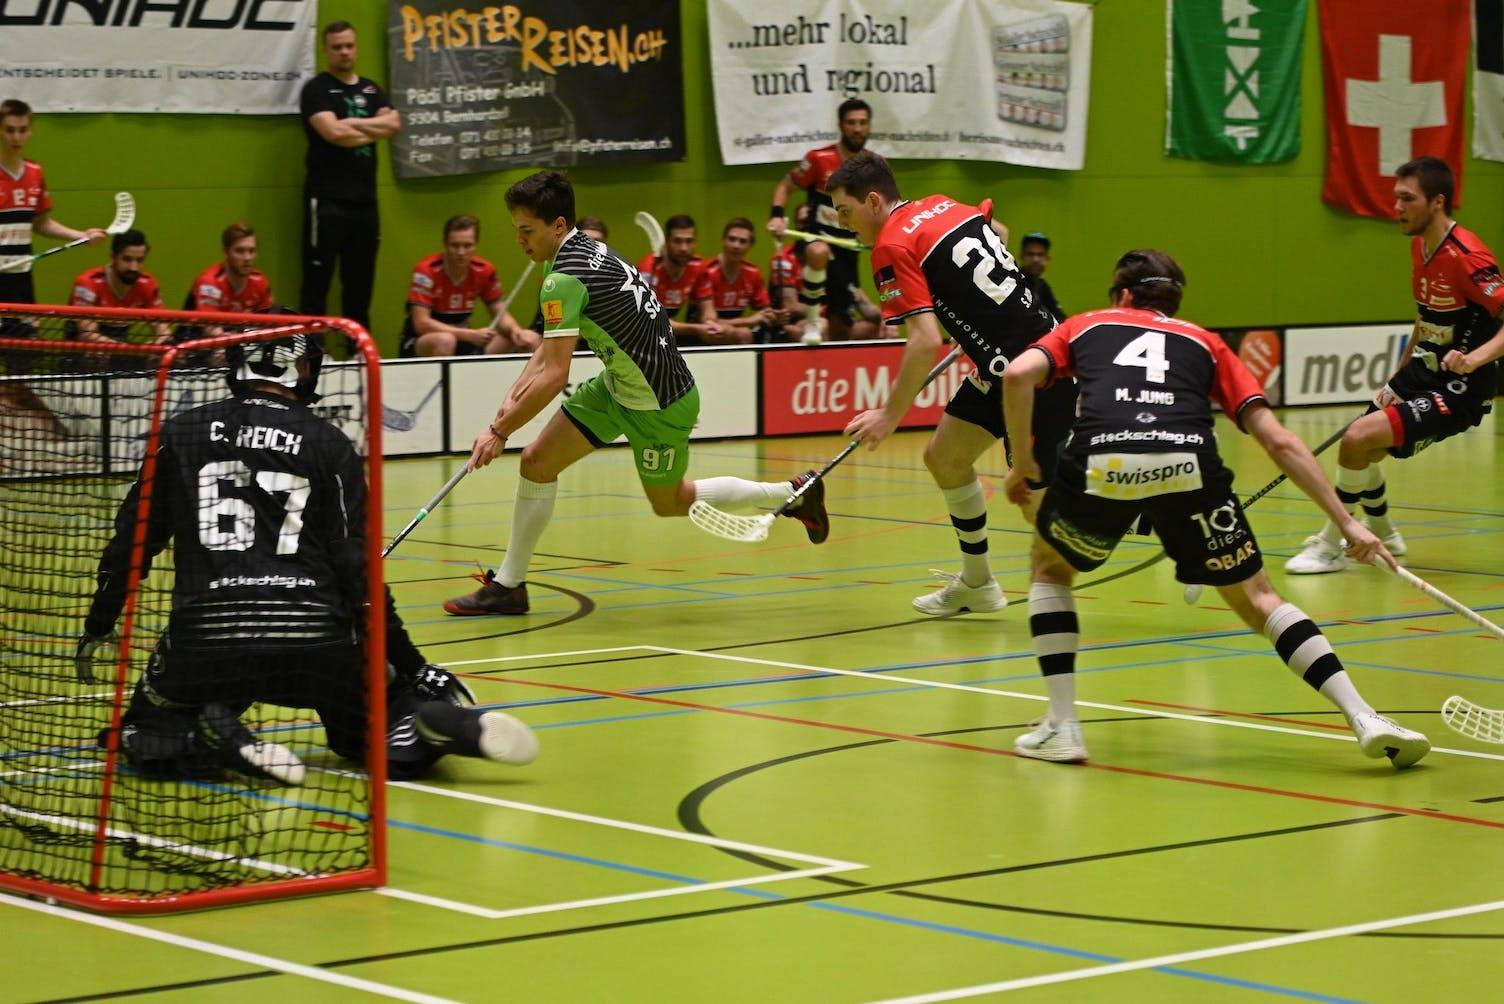 WaSa Unihockey